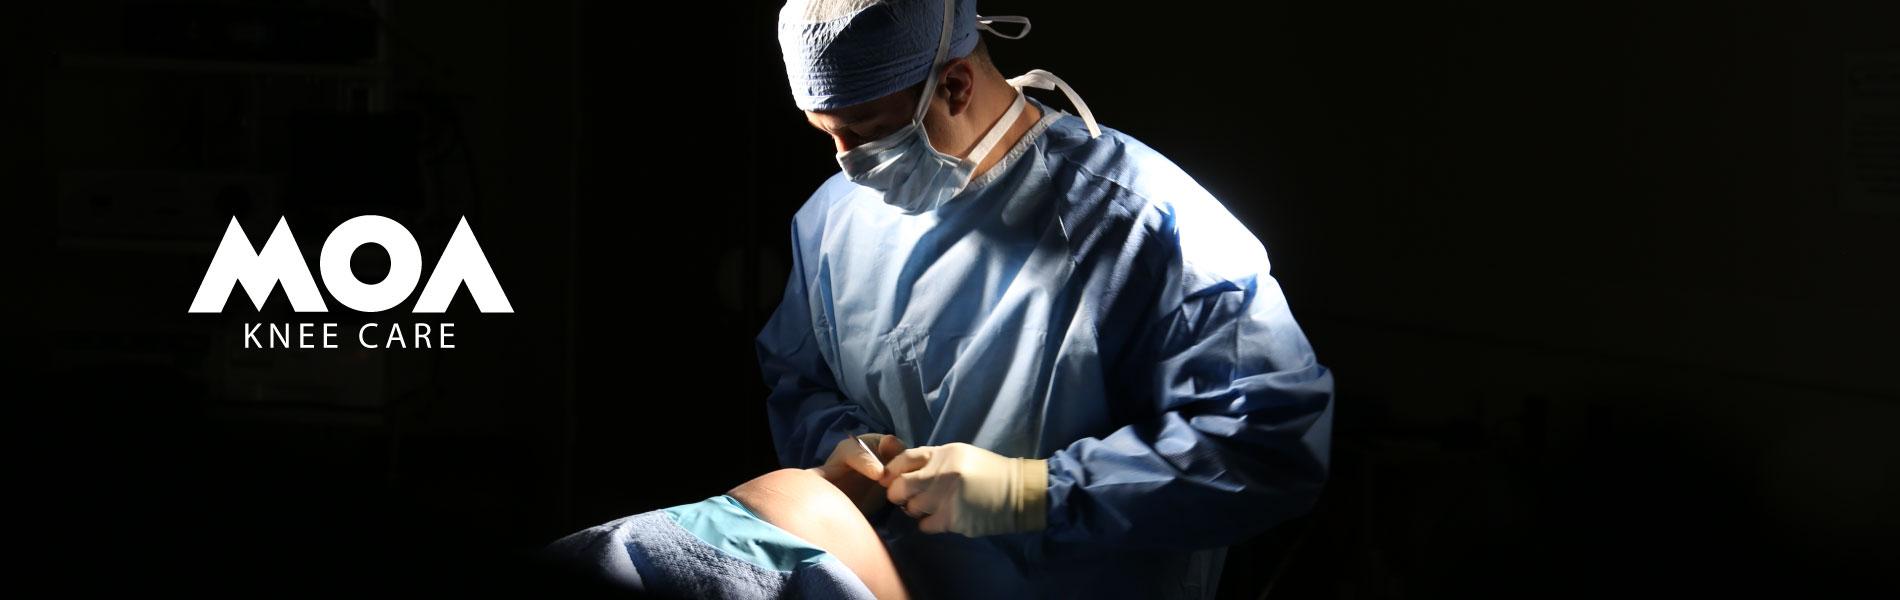 MOA-website-banner-image-knee